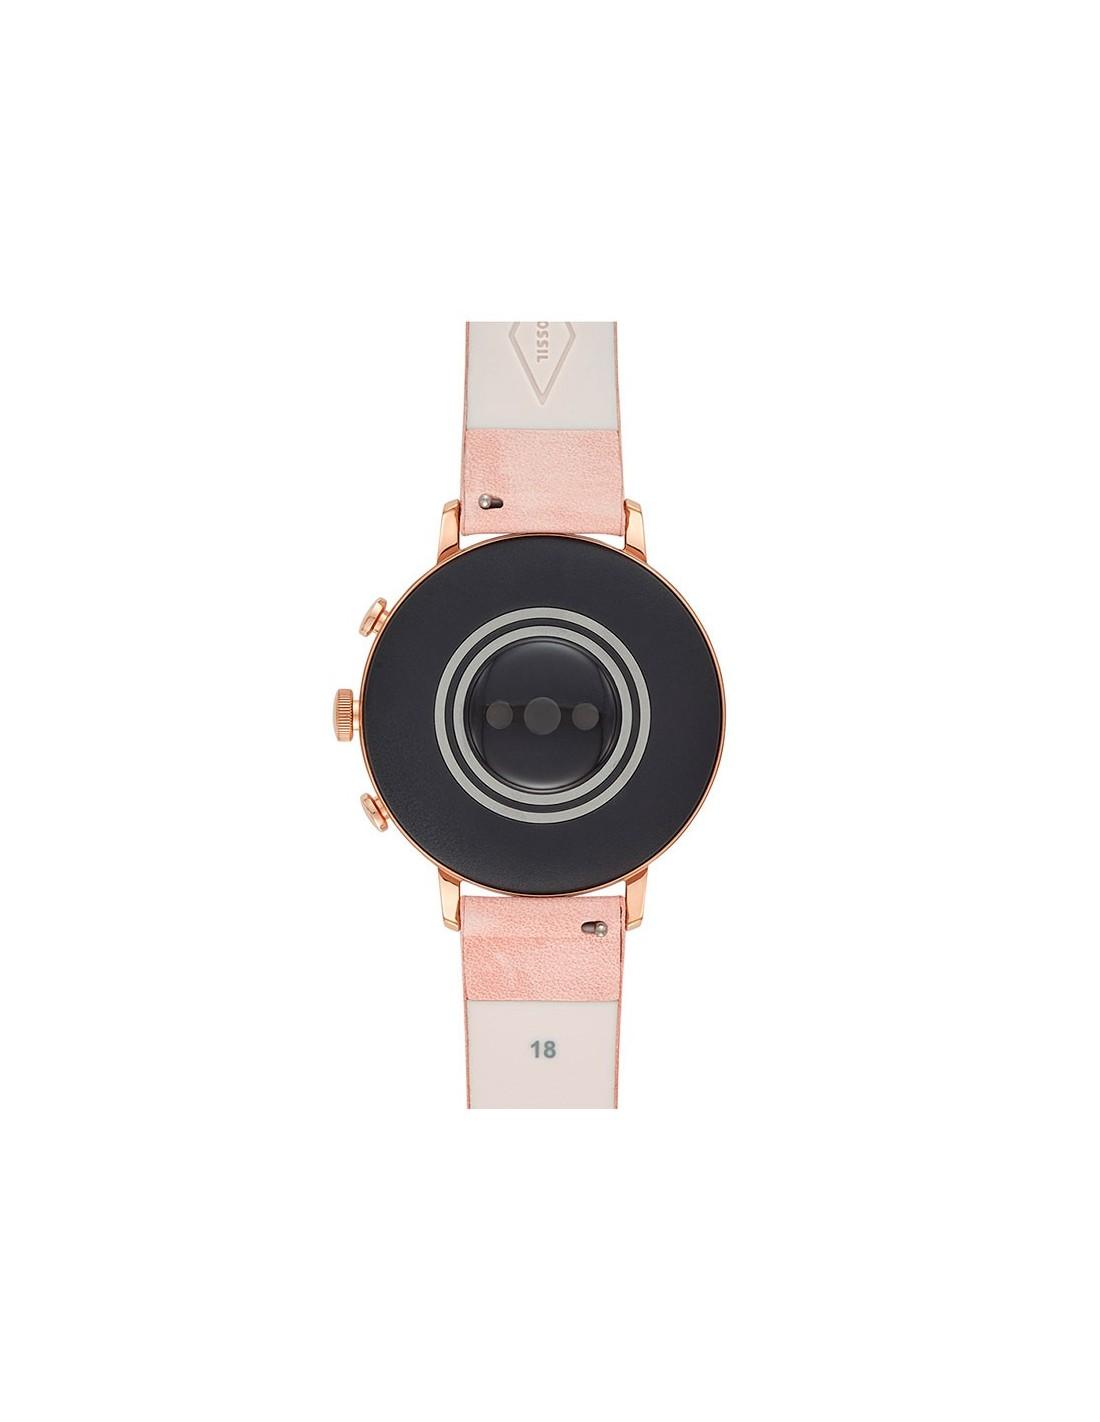 274c0accb3a4 Reloj FTW6015 Fossil Smartwatch